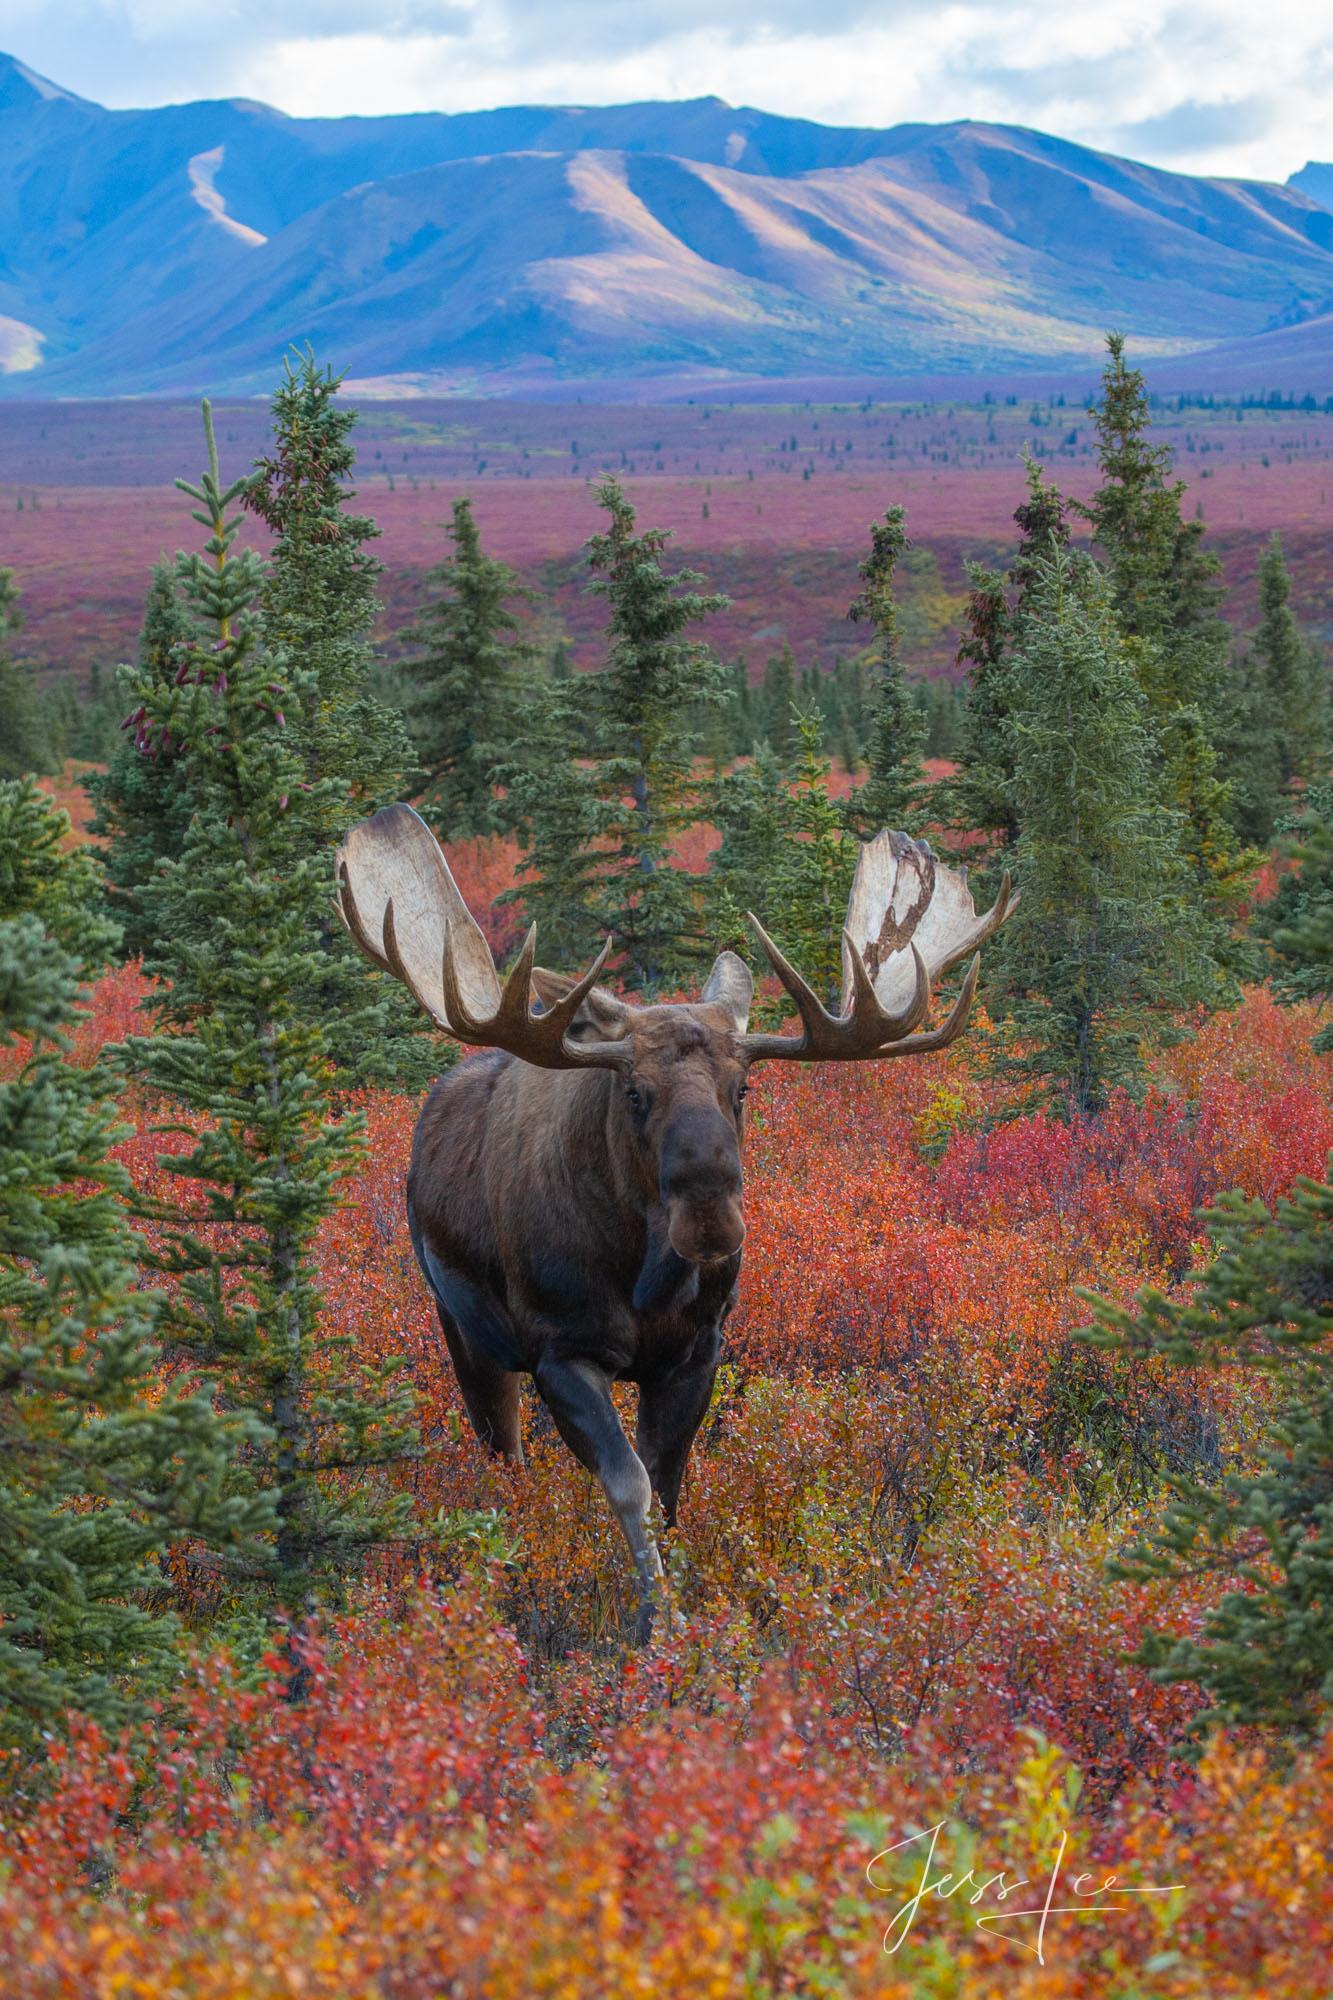 Moose, print, fine art, mammals, photograph, photo, wilderness,, photo